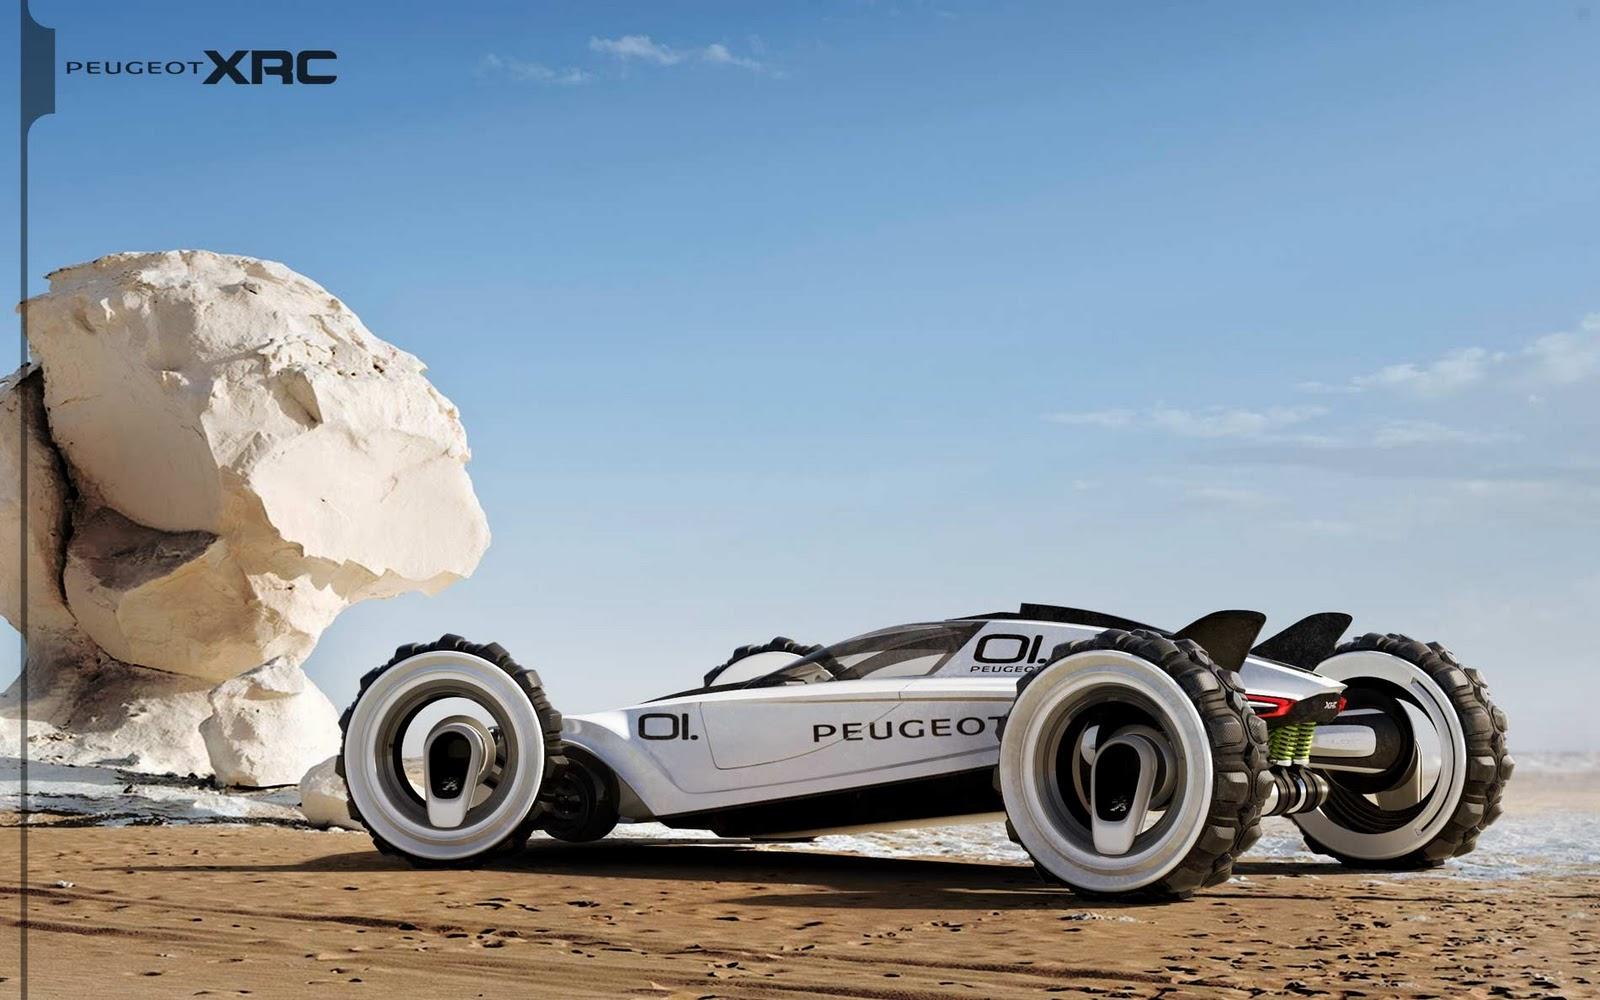 Peugeot-XRC-4.jpg